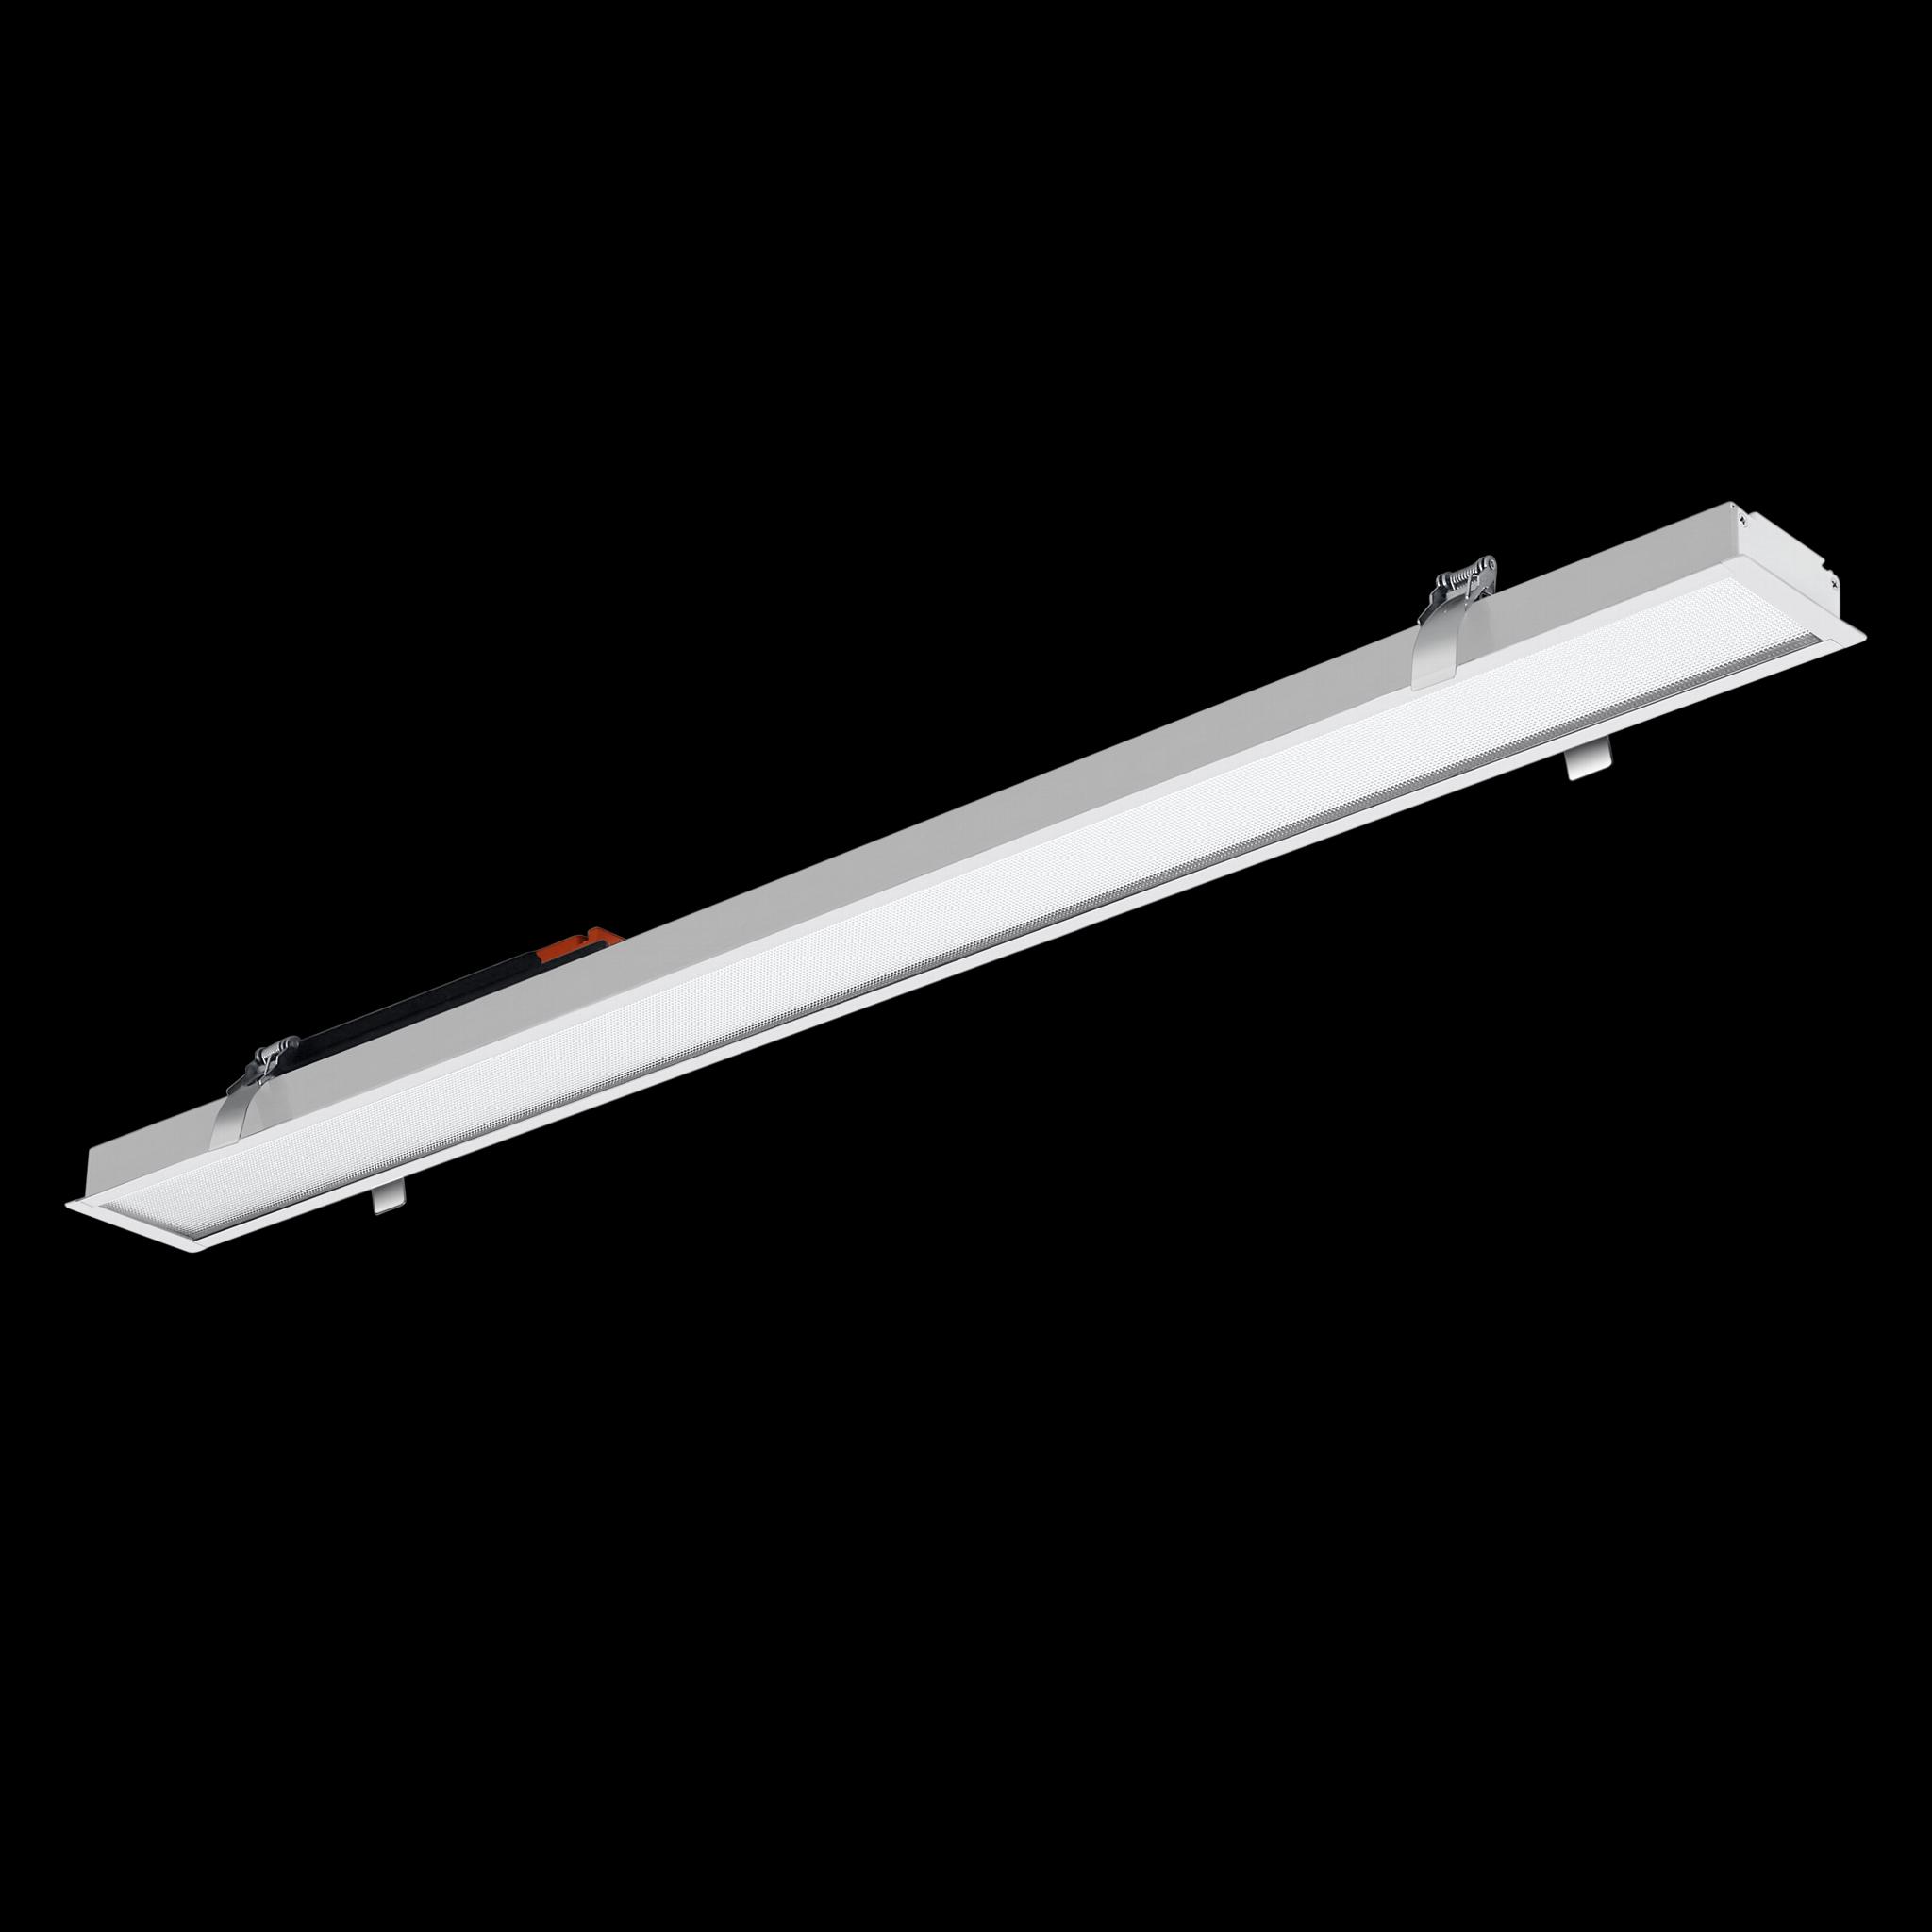 嵌入式LED線性燈 LE8030-PZ 4